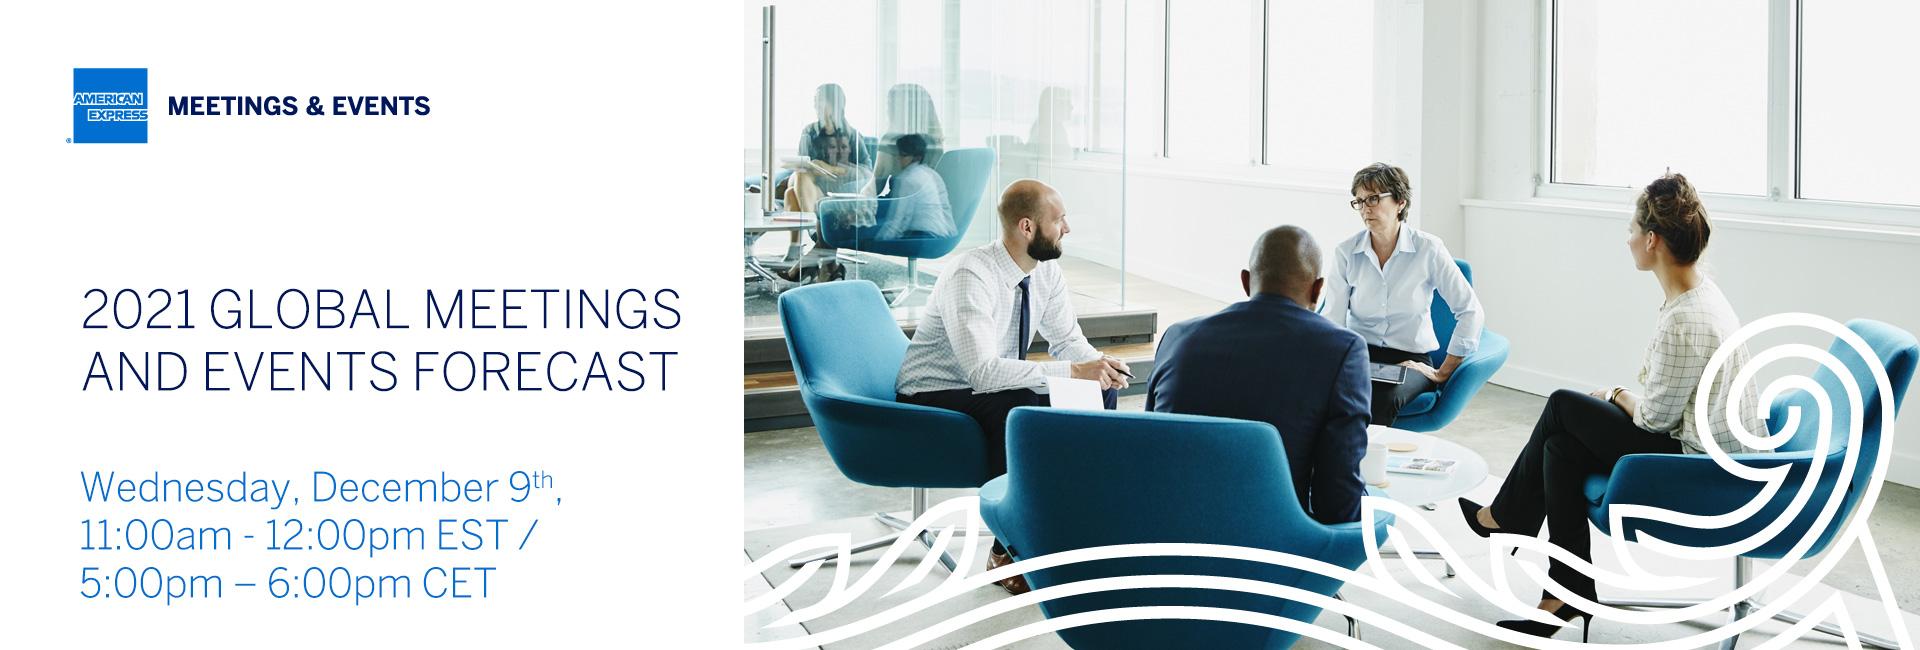 Webinar: 2021 Global Meetings and Events Forecast